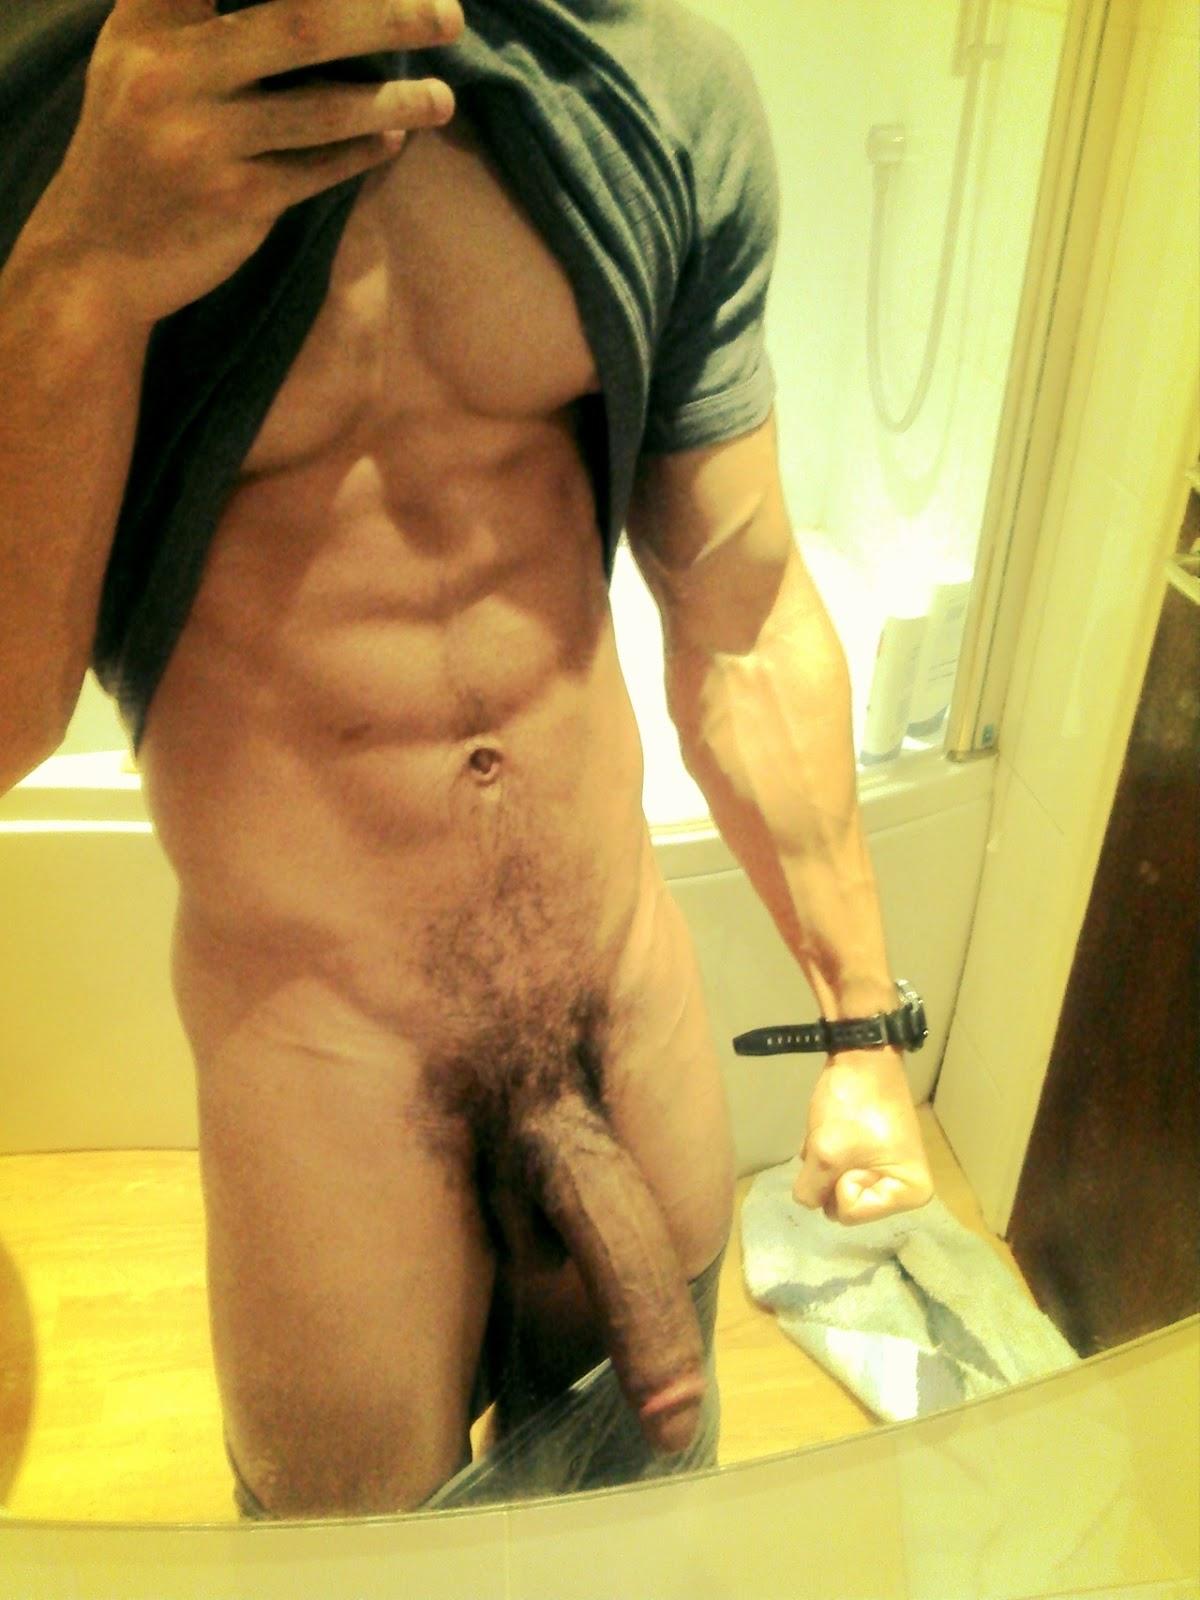 Nude man self shots